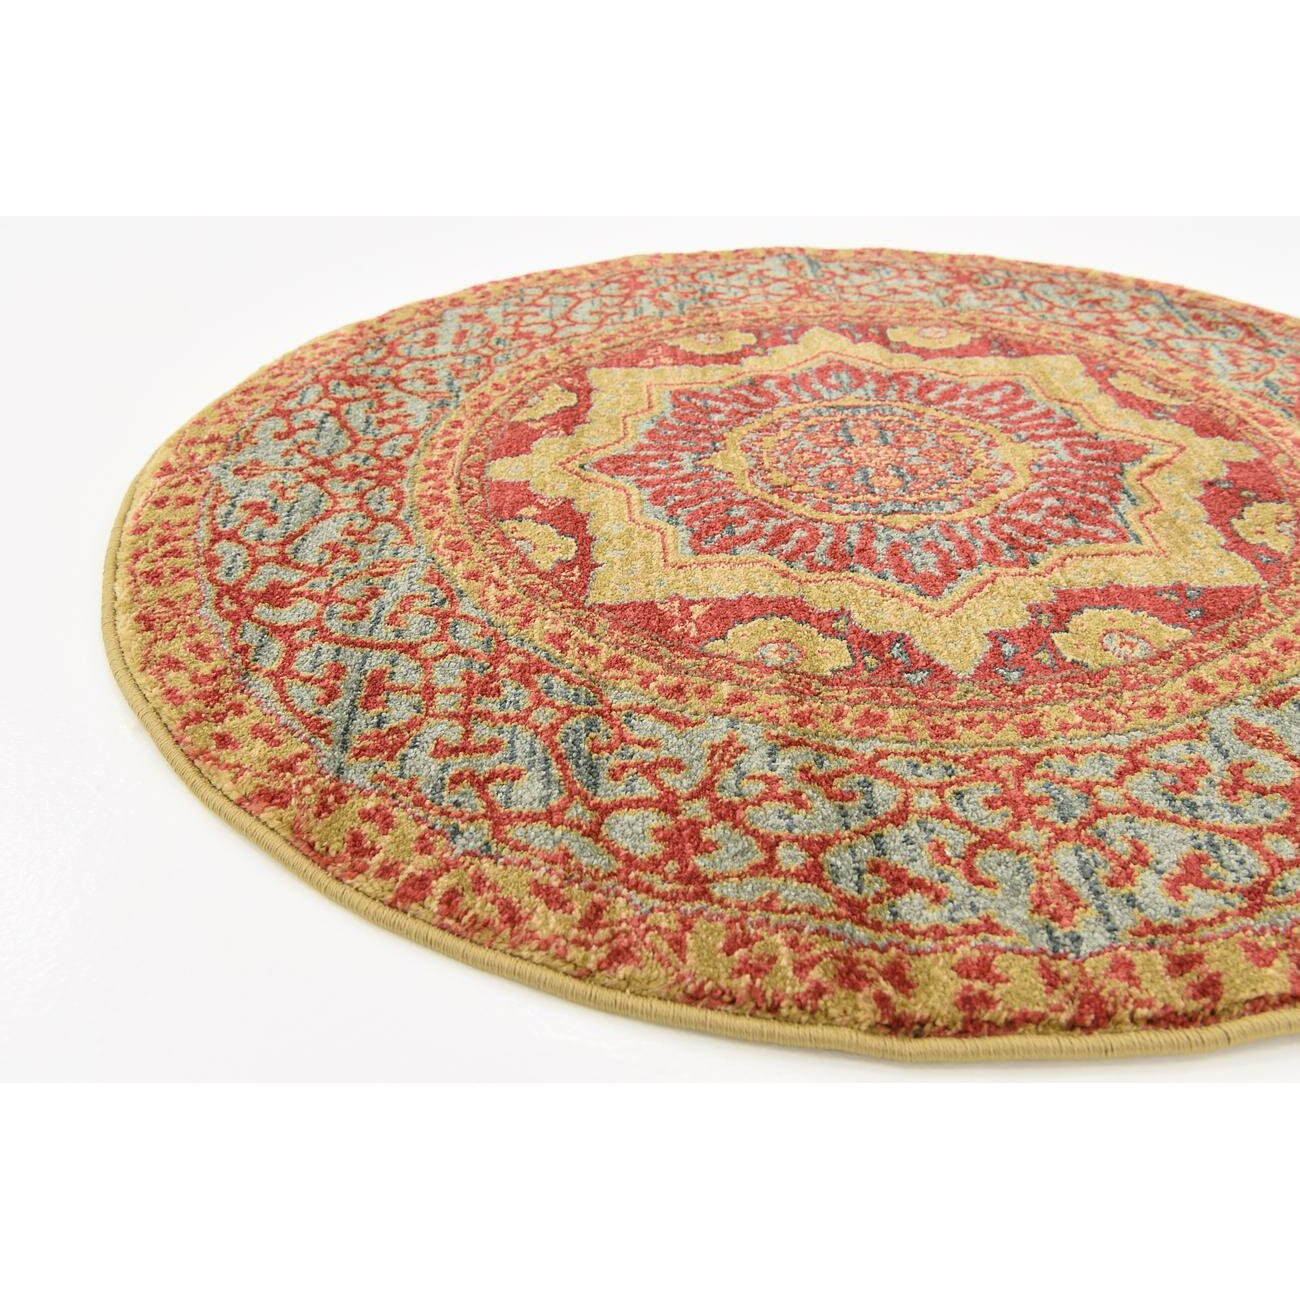 Astoria grand laurelwood red area rug reviews wayfair for Laurelwood